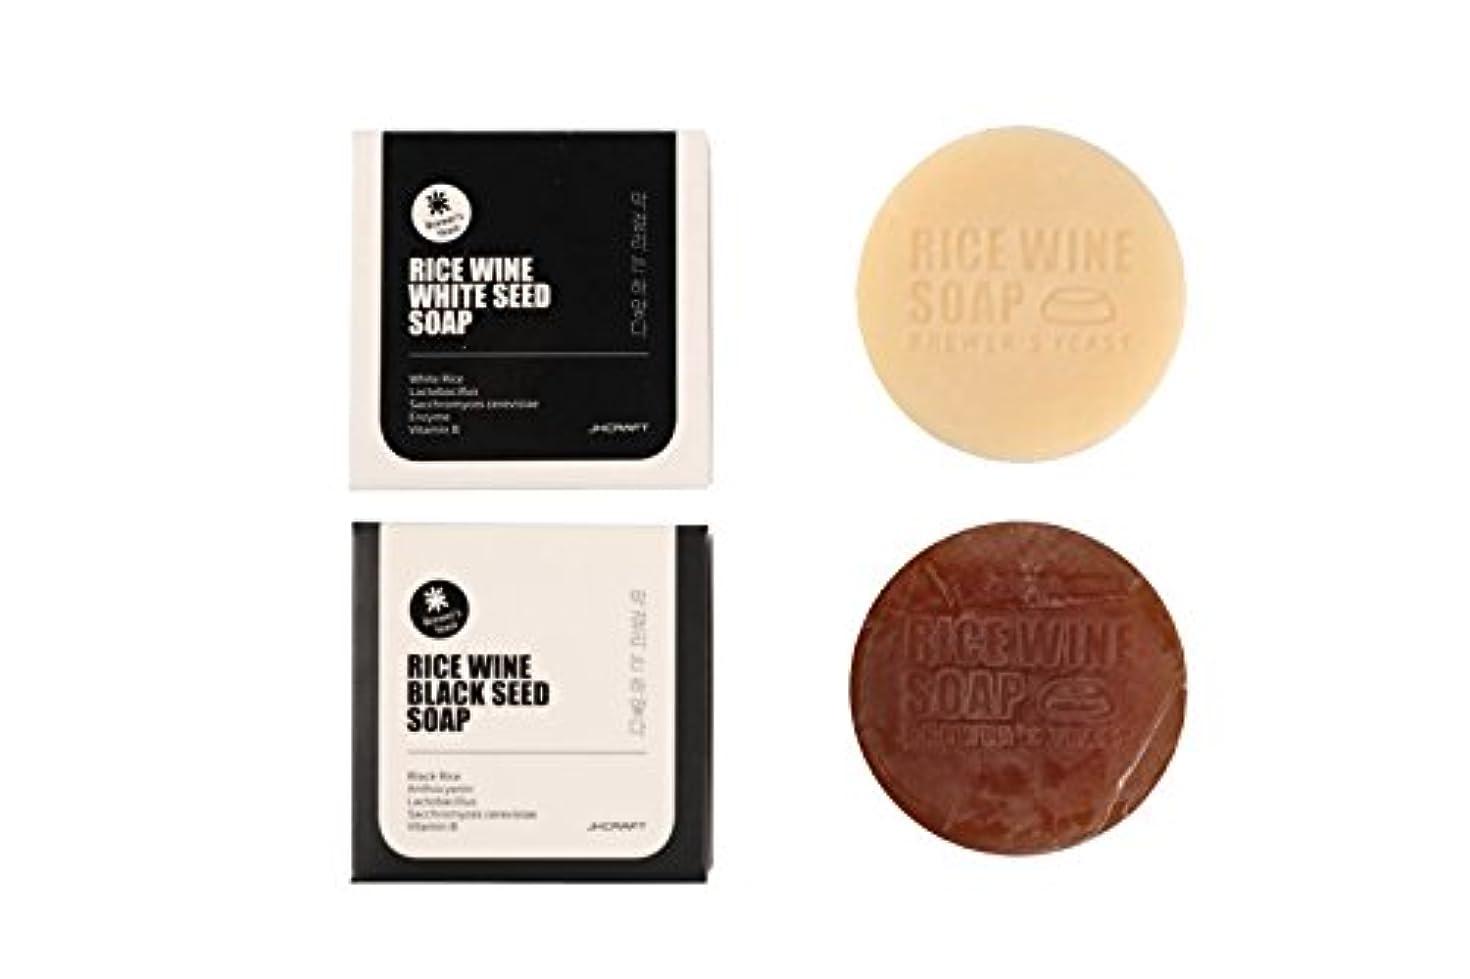 JKCRAFT RICEWINE WHITE&BLACK SEED SOAP マッコリ酵母石鹸 & 黒米マッコリ酵母石鹸 2pcs [並行輸入品]